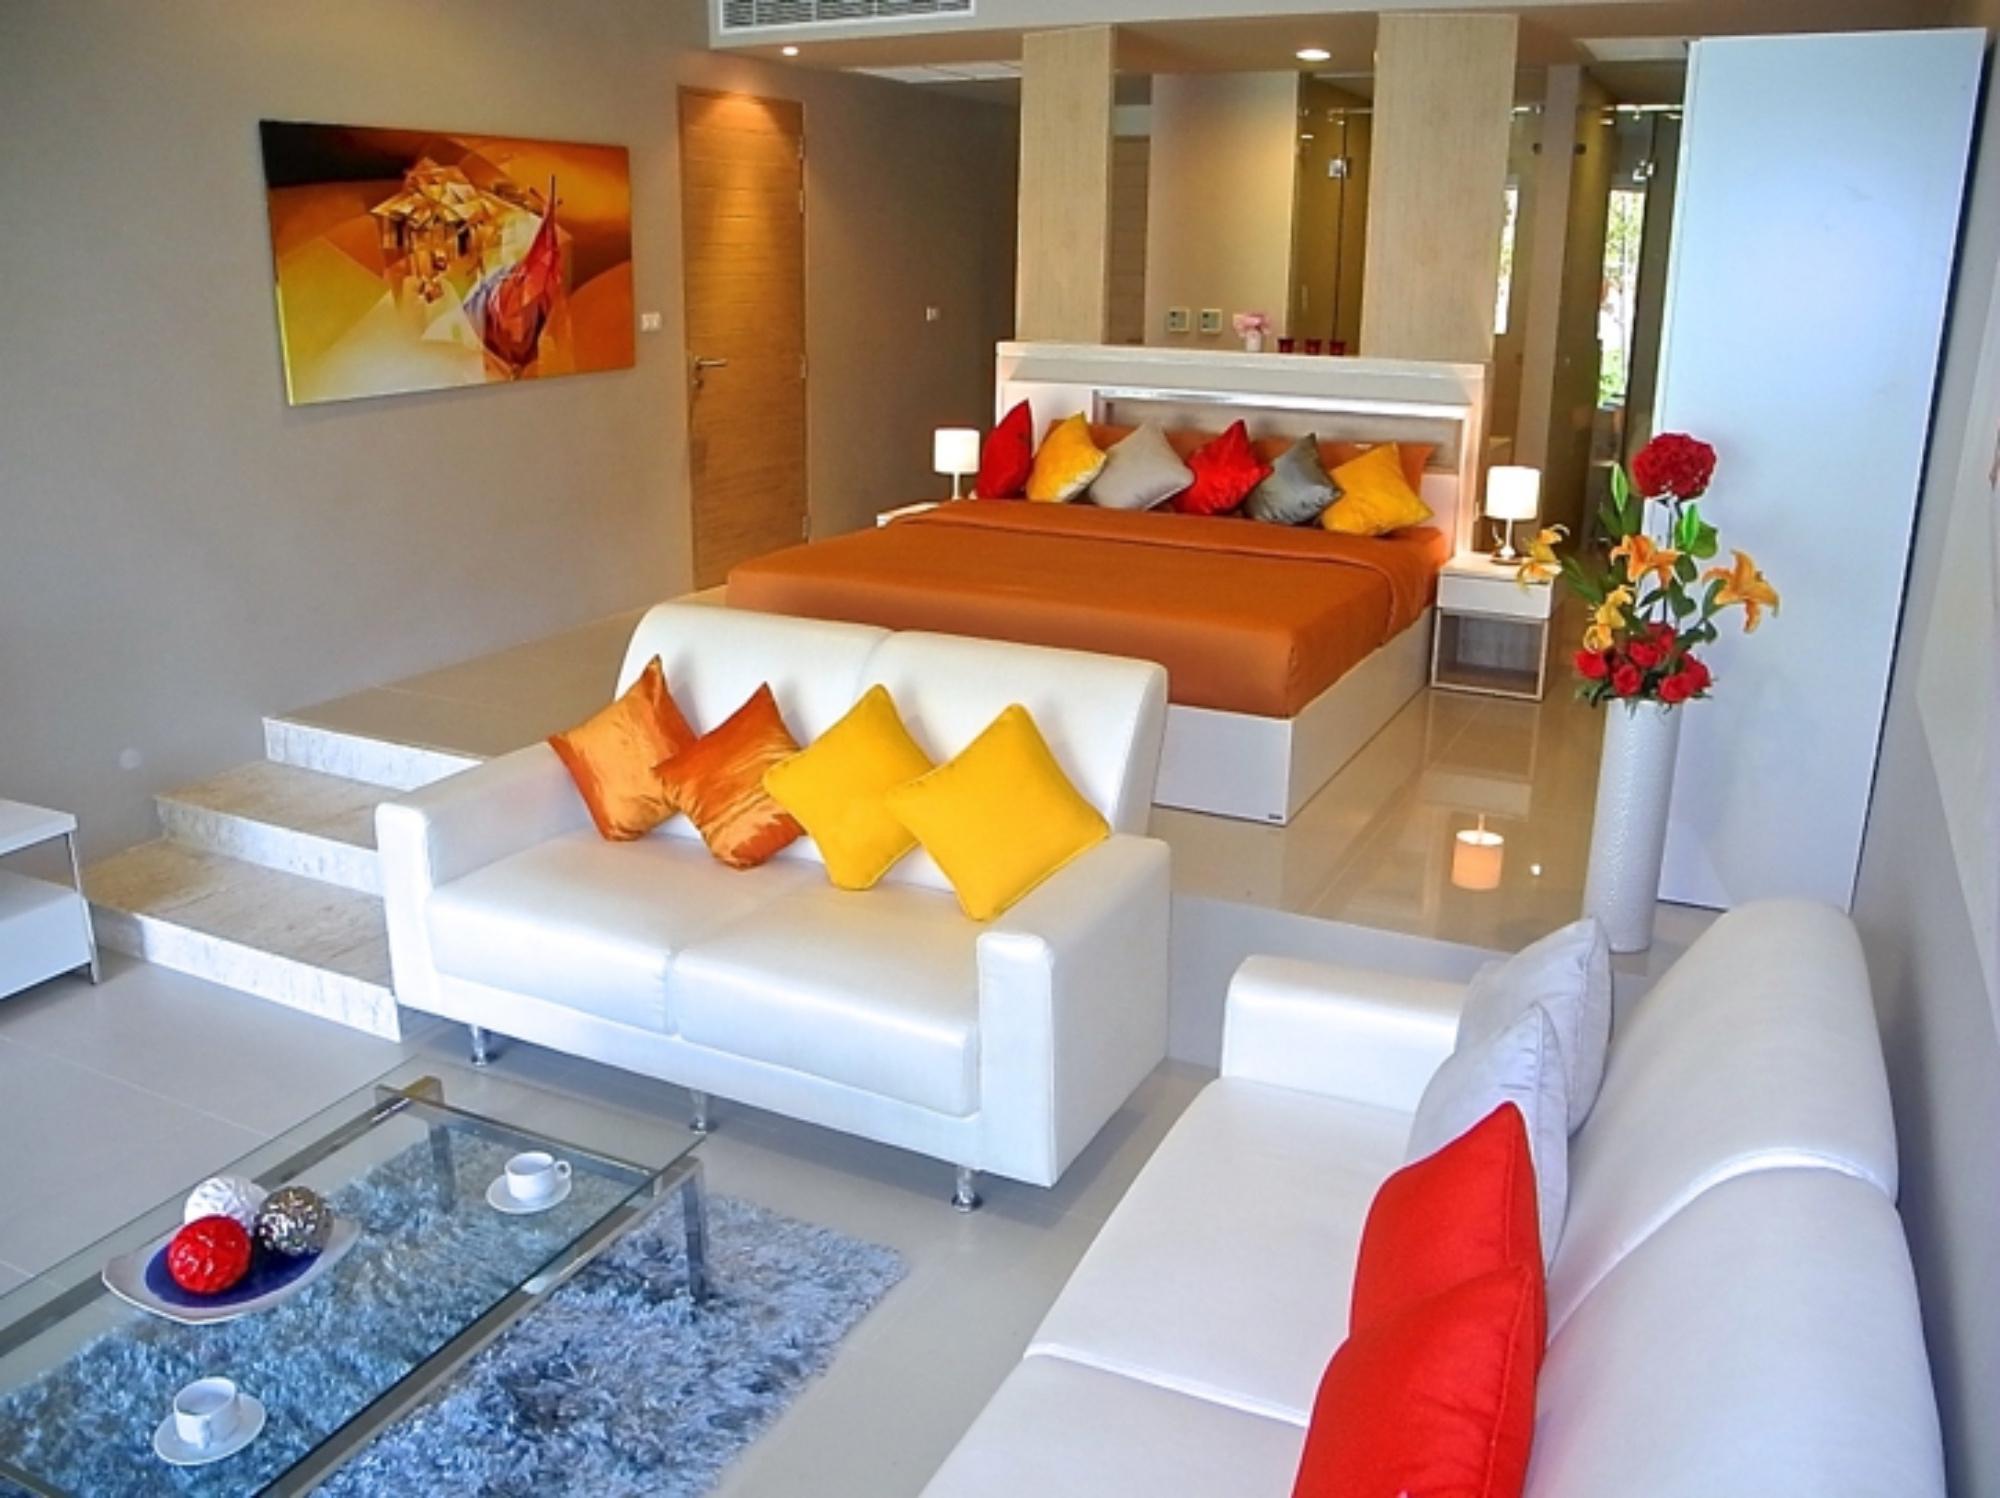 Pool access apartment in Karon อพาร์ตเมนต์ 1 ห้องนอน 1 ห้องน้ำส่วนตัว ขนาด 70 ตร.ม. – กะรน